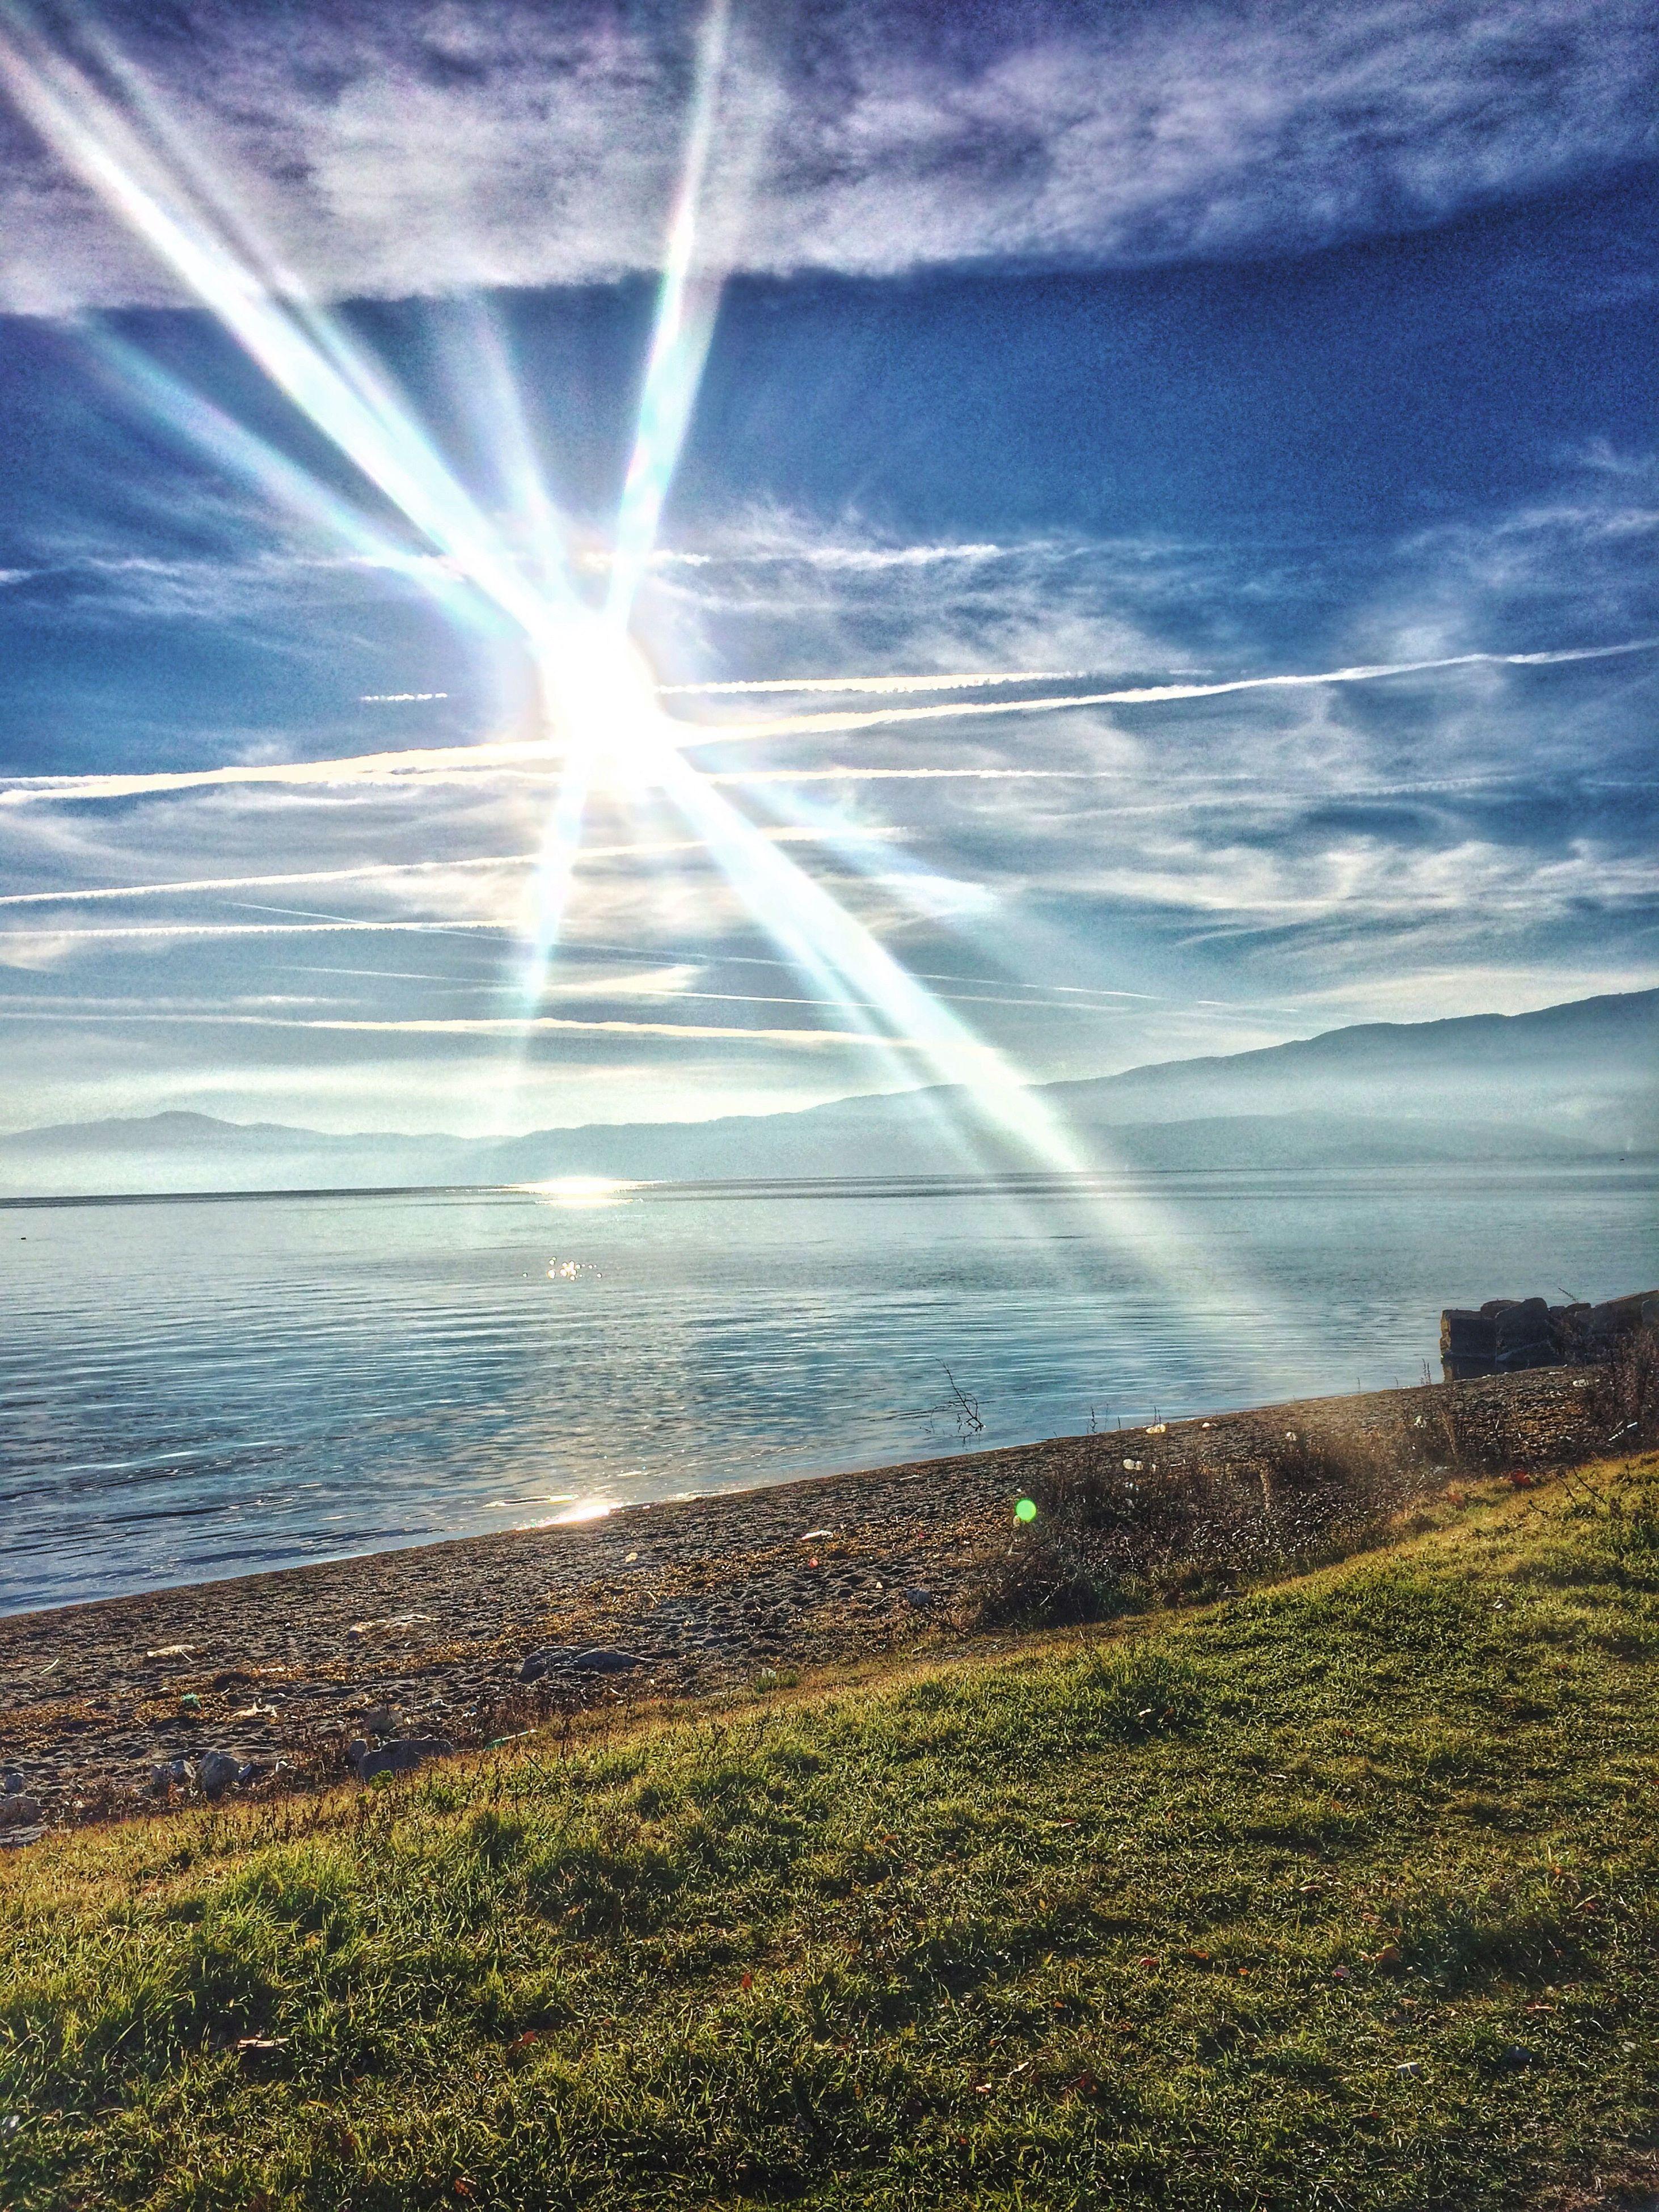 water, tranquil scene, scenics, beauty in nature, sunbeam, sky, sun, tranquility, sunlight, sea, horizon over water, nature, lens flare, idyllic, blue, grass, cloud - sky, sunny, landscape, day